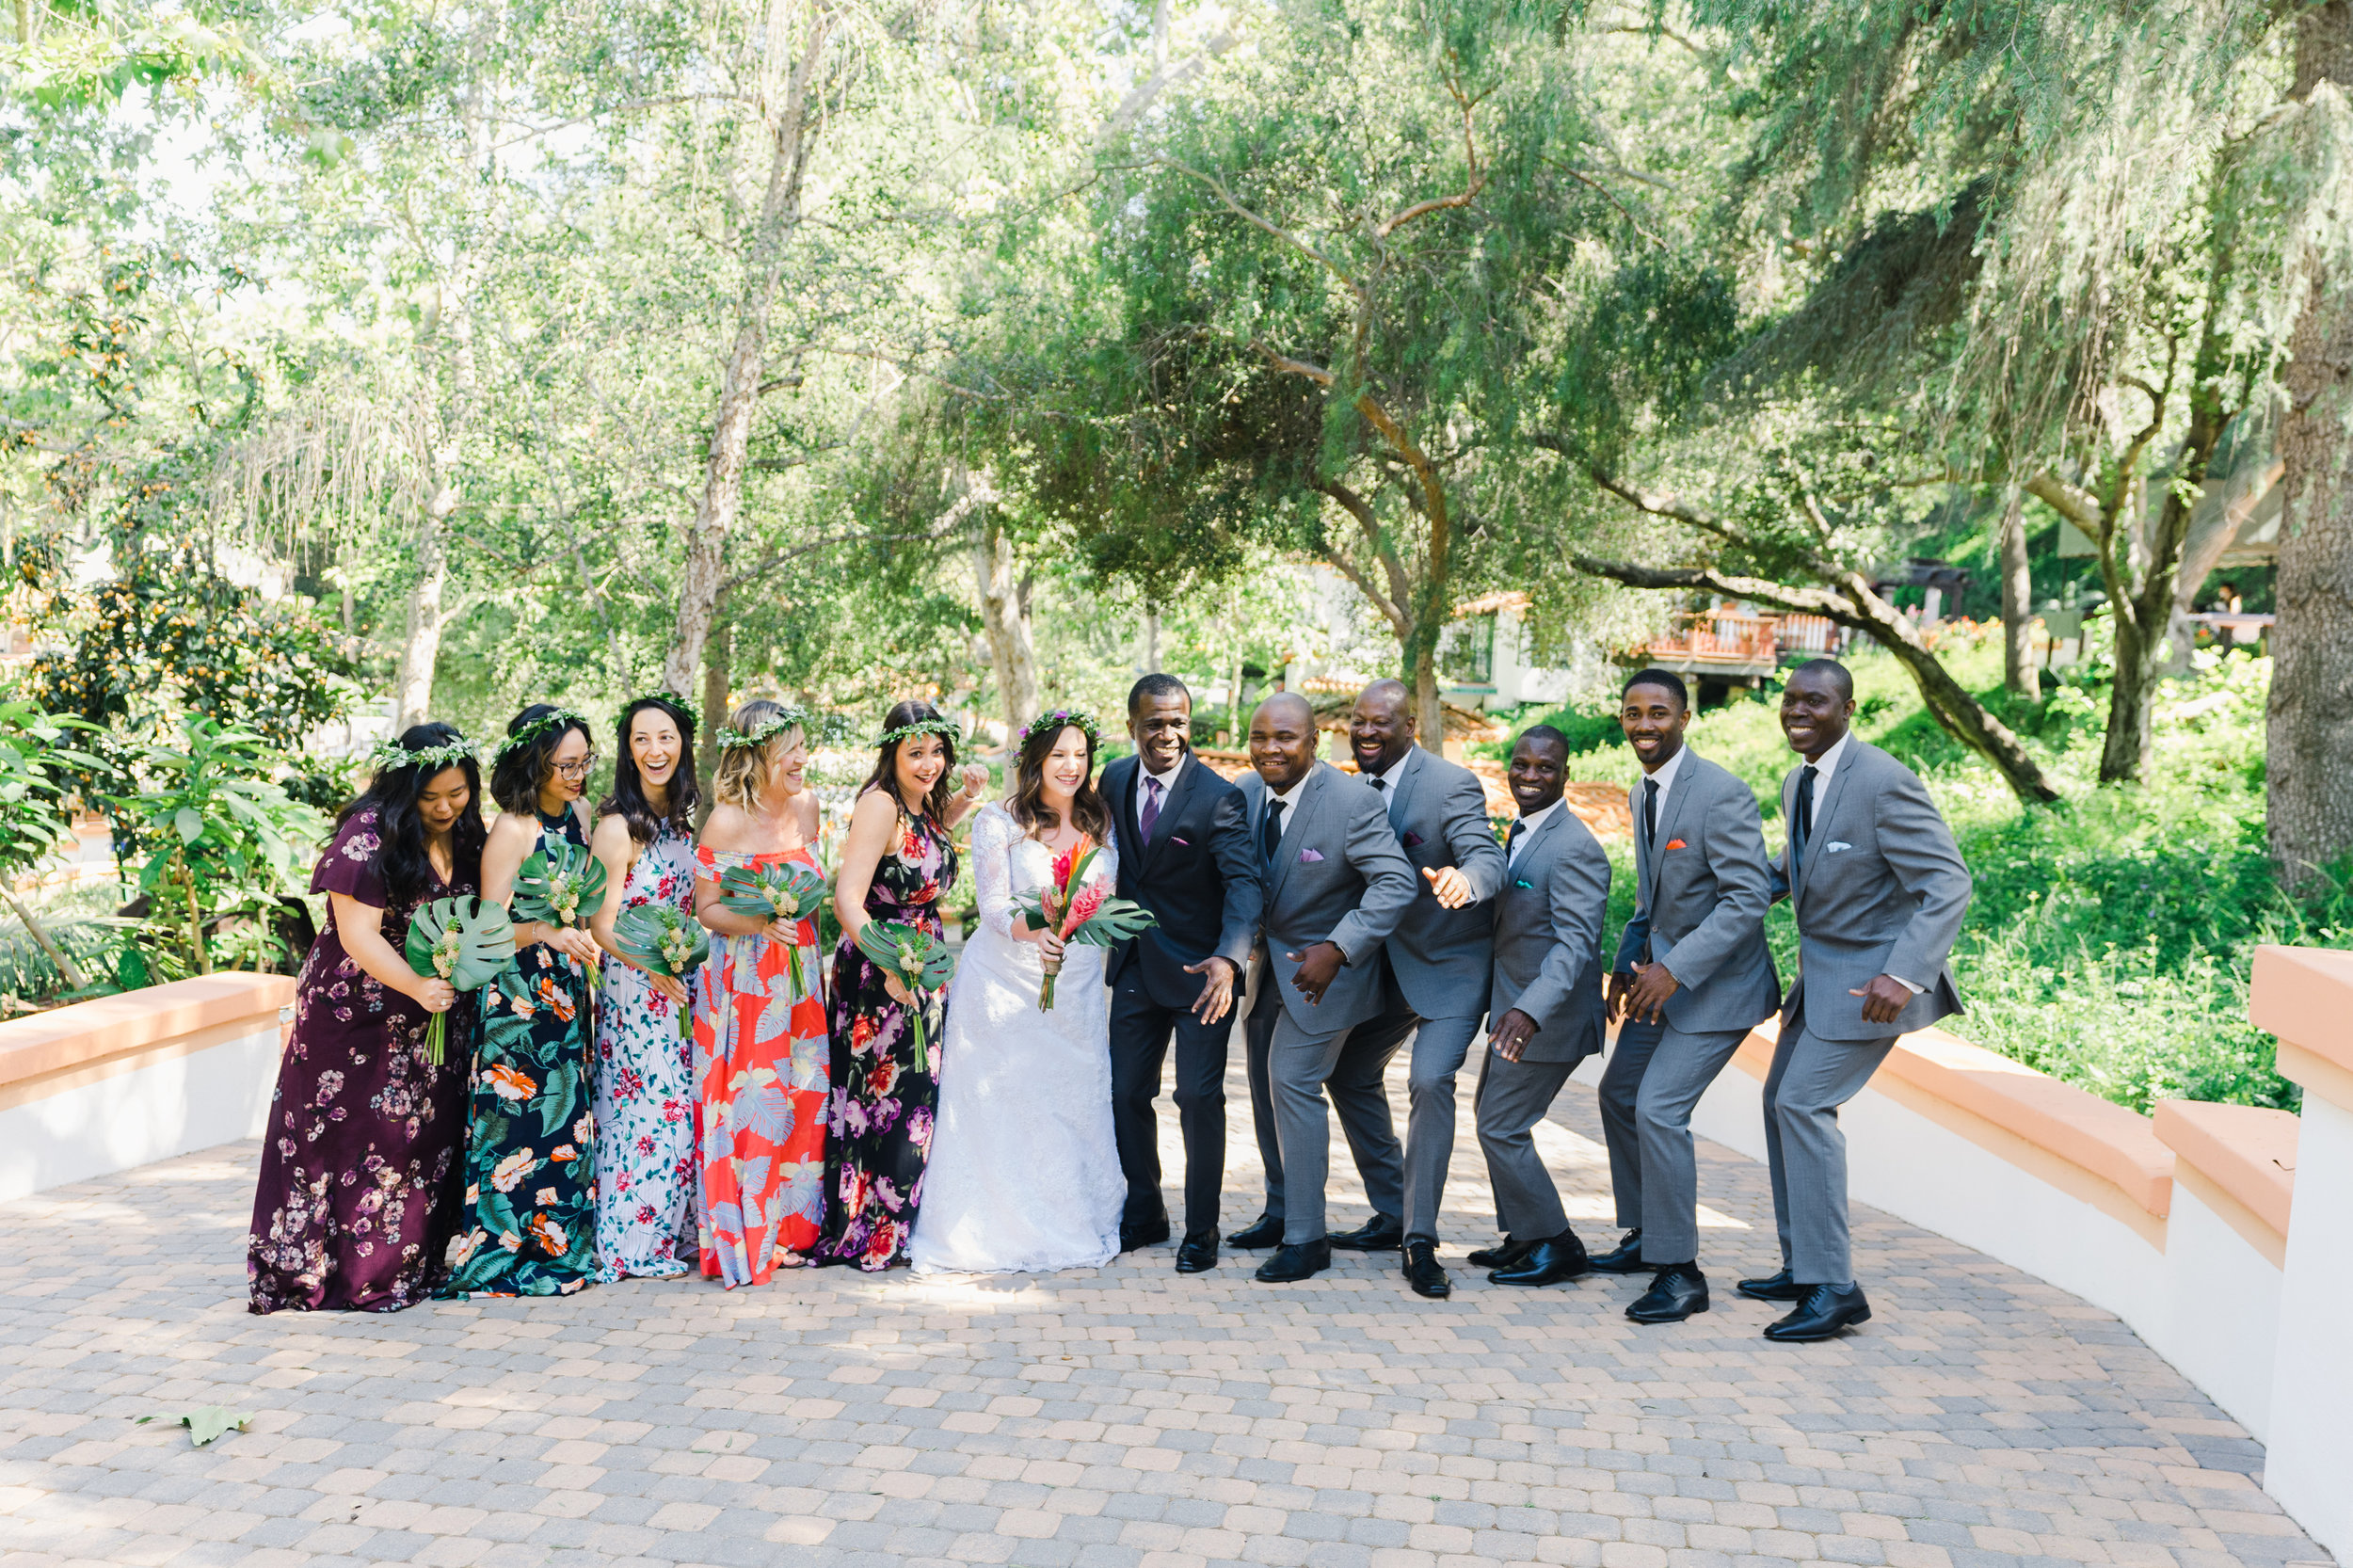 rancho-las-lomas-wedding-kelsey-sim_0080.JPG